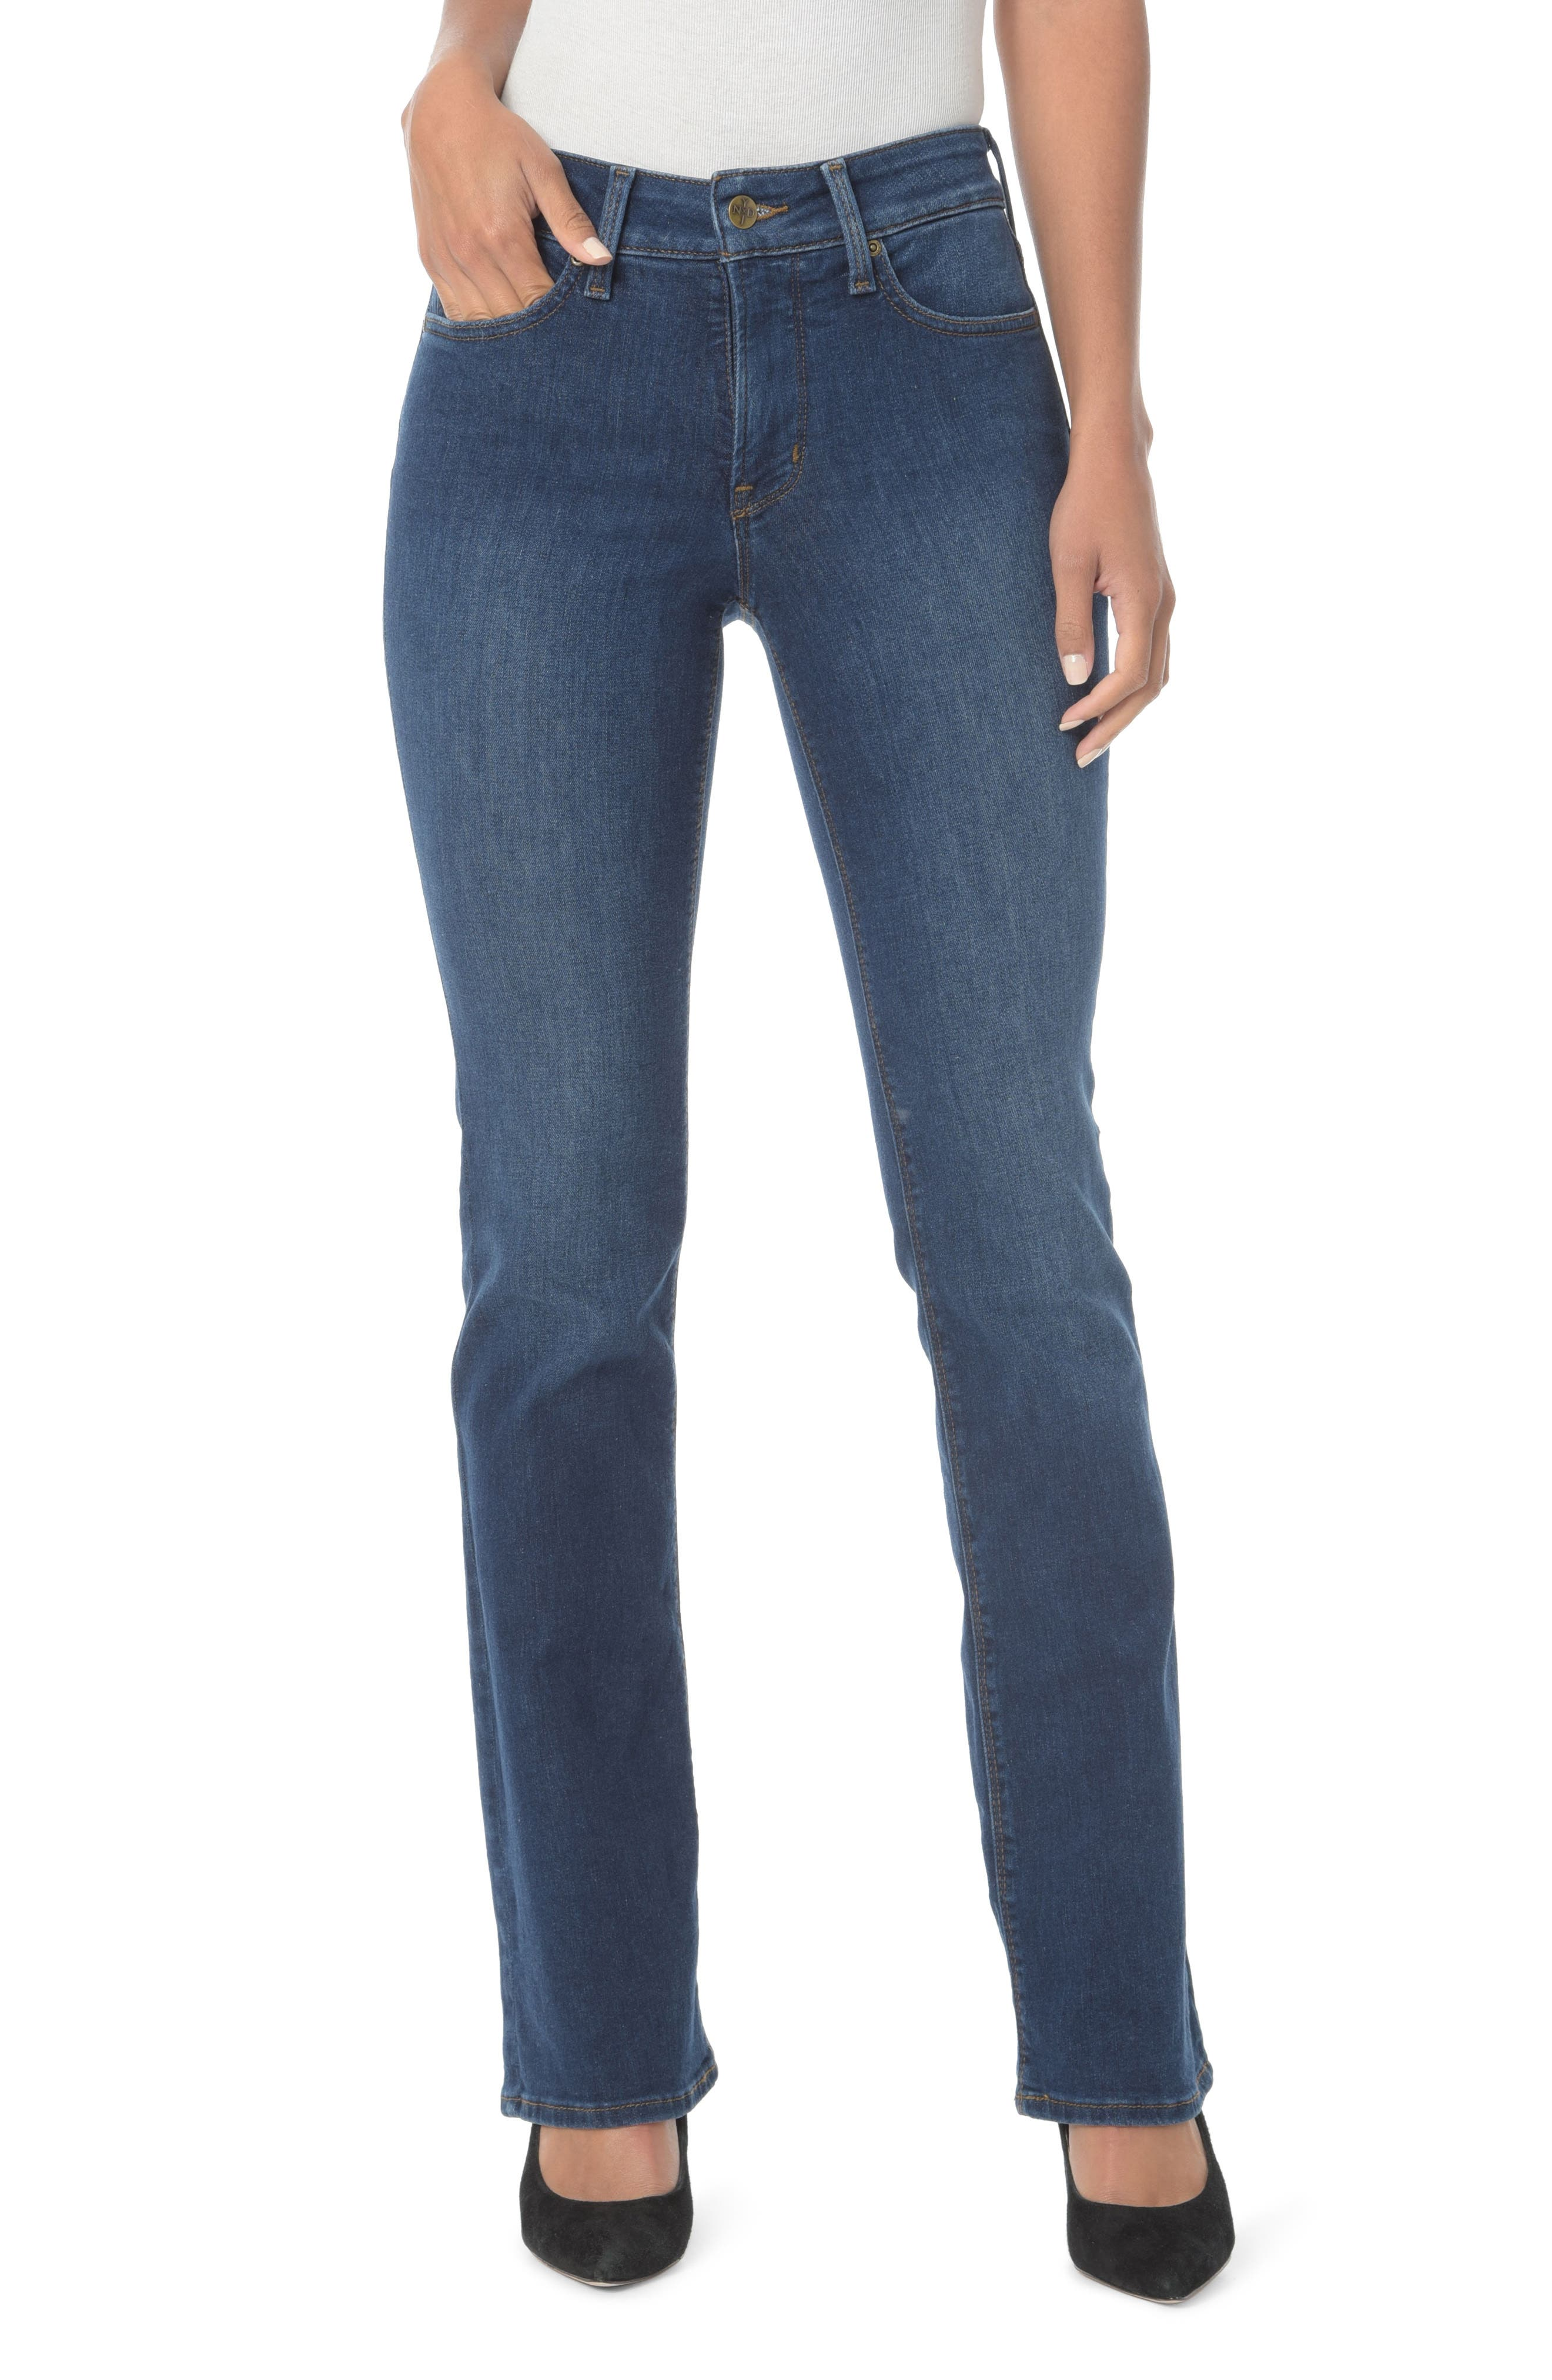 NYDJ, Barbara High Waist Stretch Bootcut Jeans, Main thumbnail 1, color, COOPER